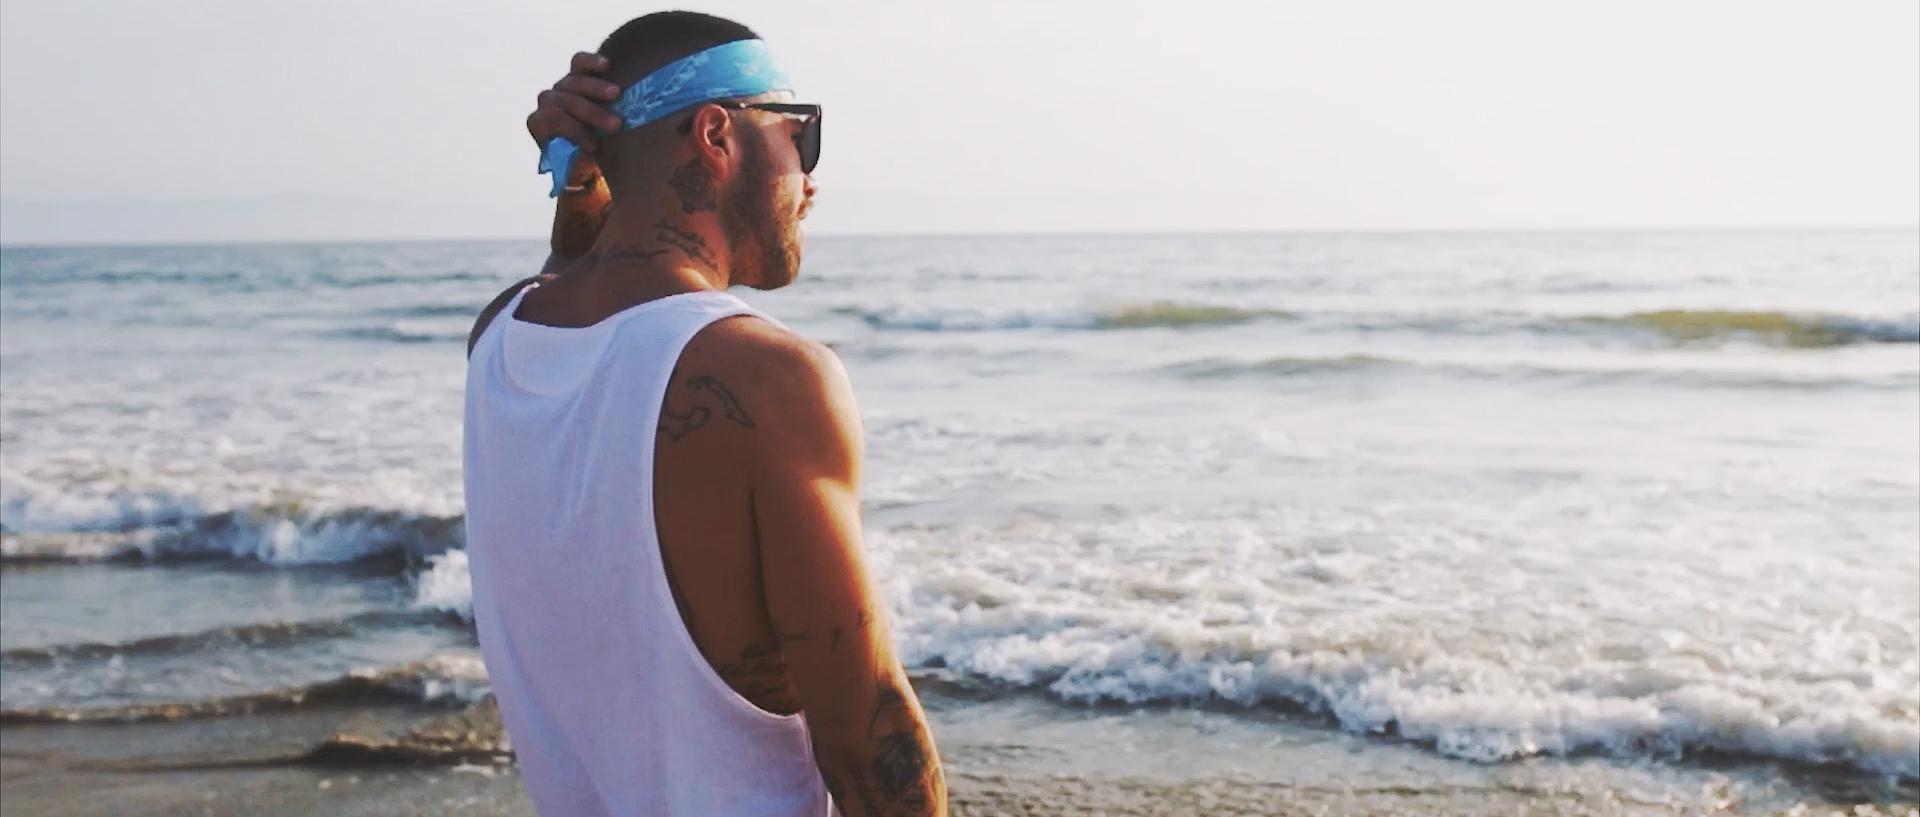 Tadeo / Acapulco Shore / Music Video